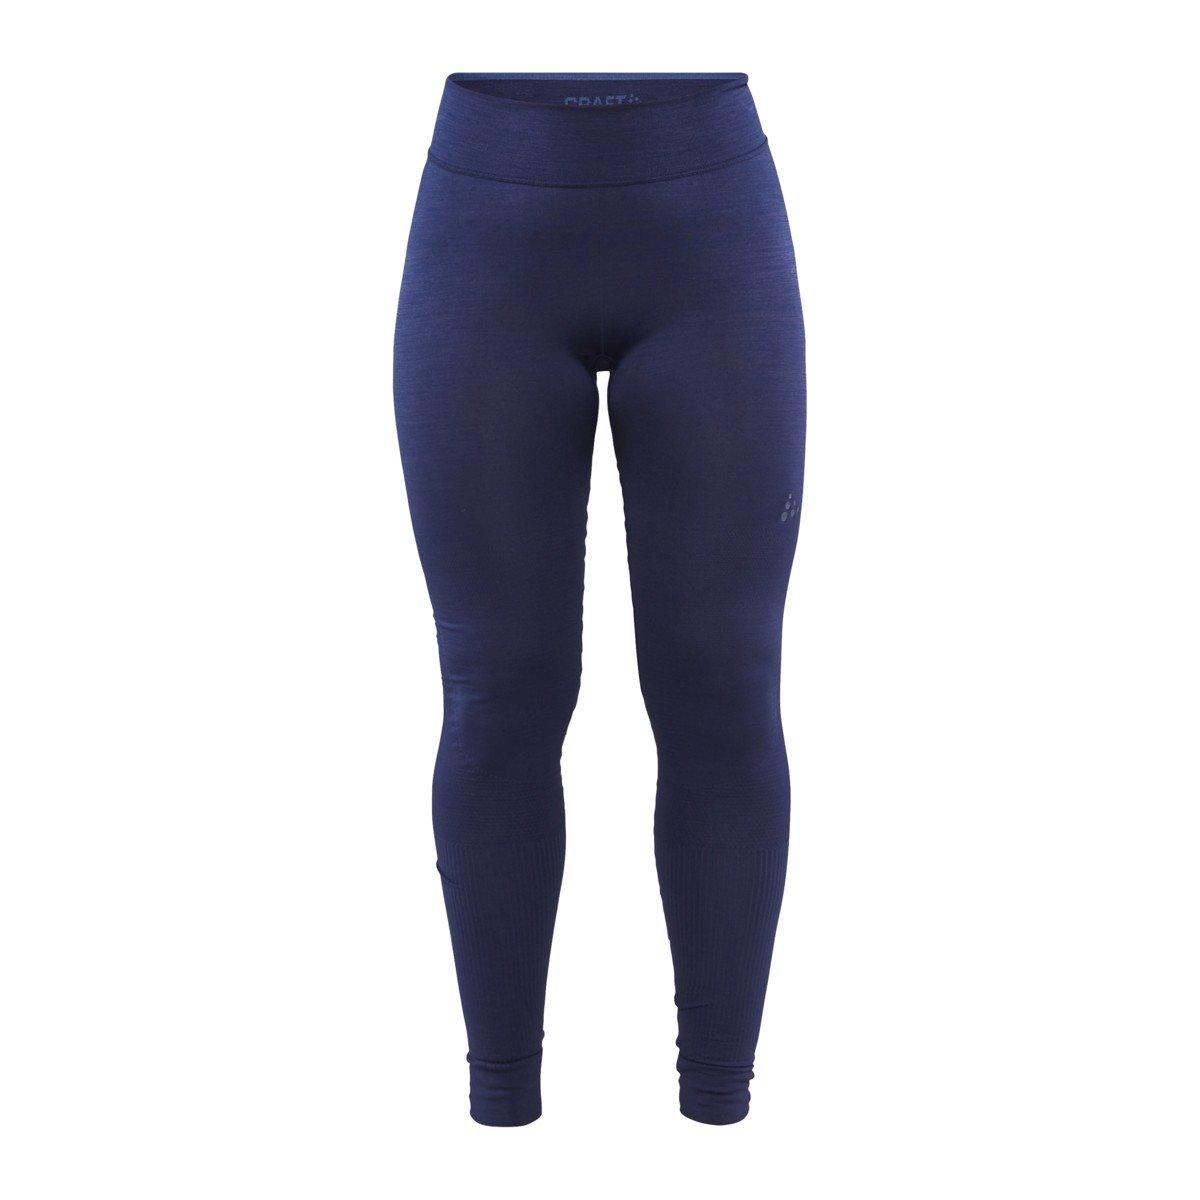 Craft W Spodky Fuseknit Comfort tmavě modrá XL